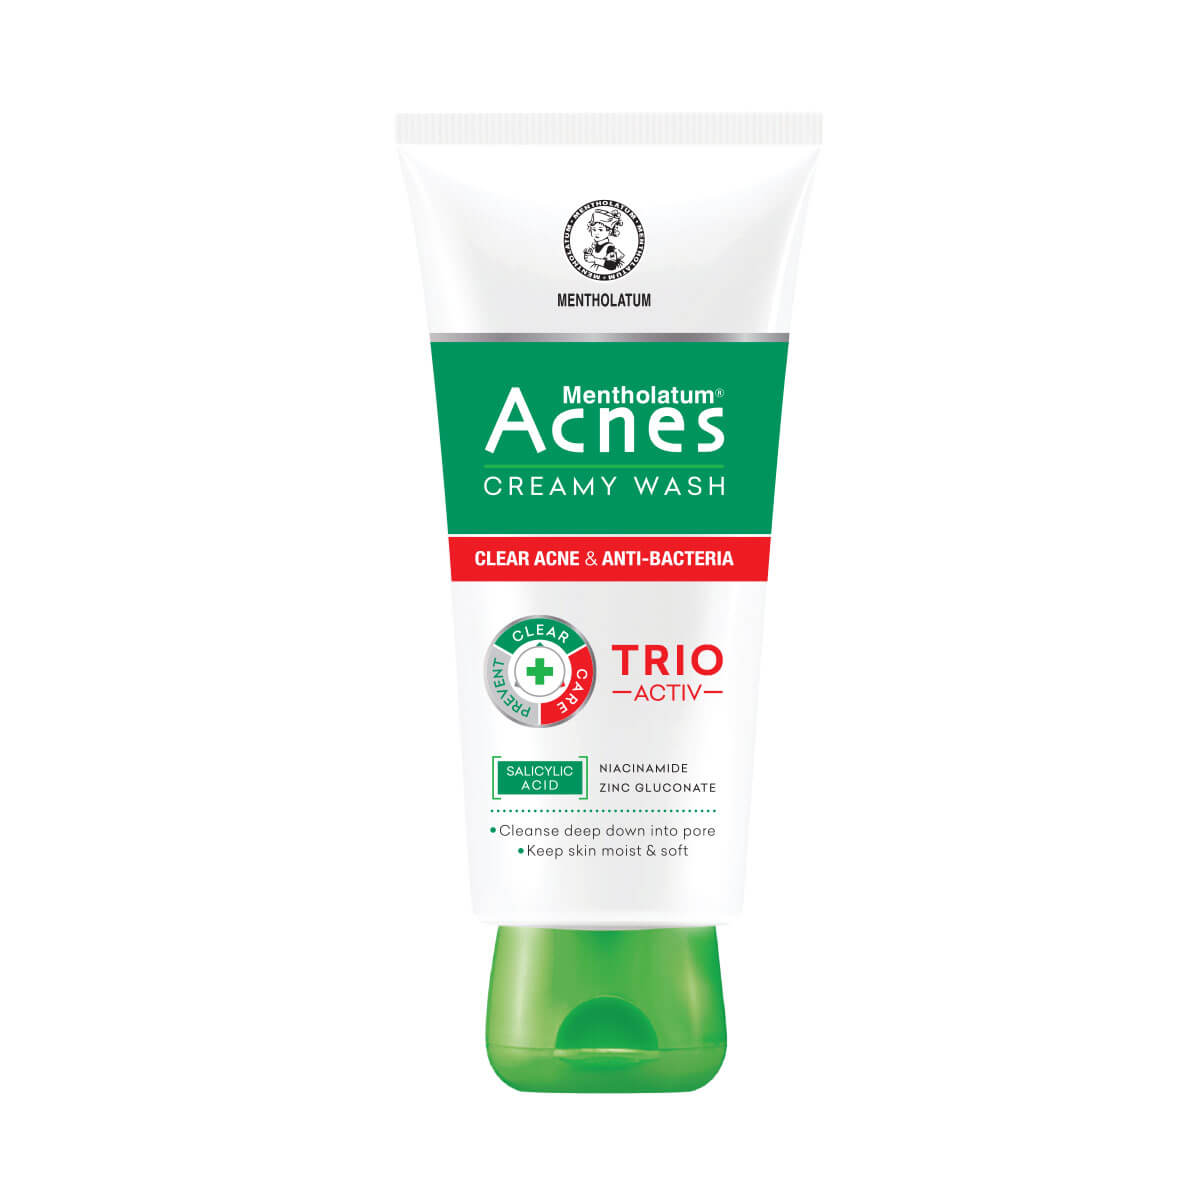 Kem rửa mặt ngừa mụn Acnes Creamy Wash hộp 1 tuýp 50g